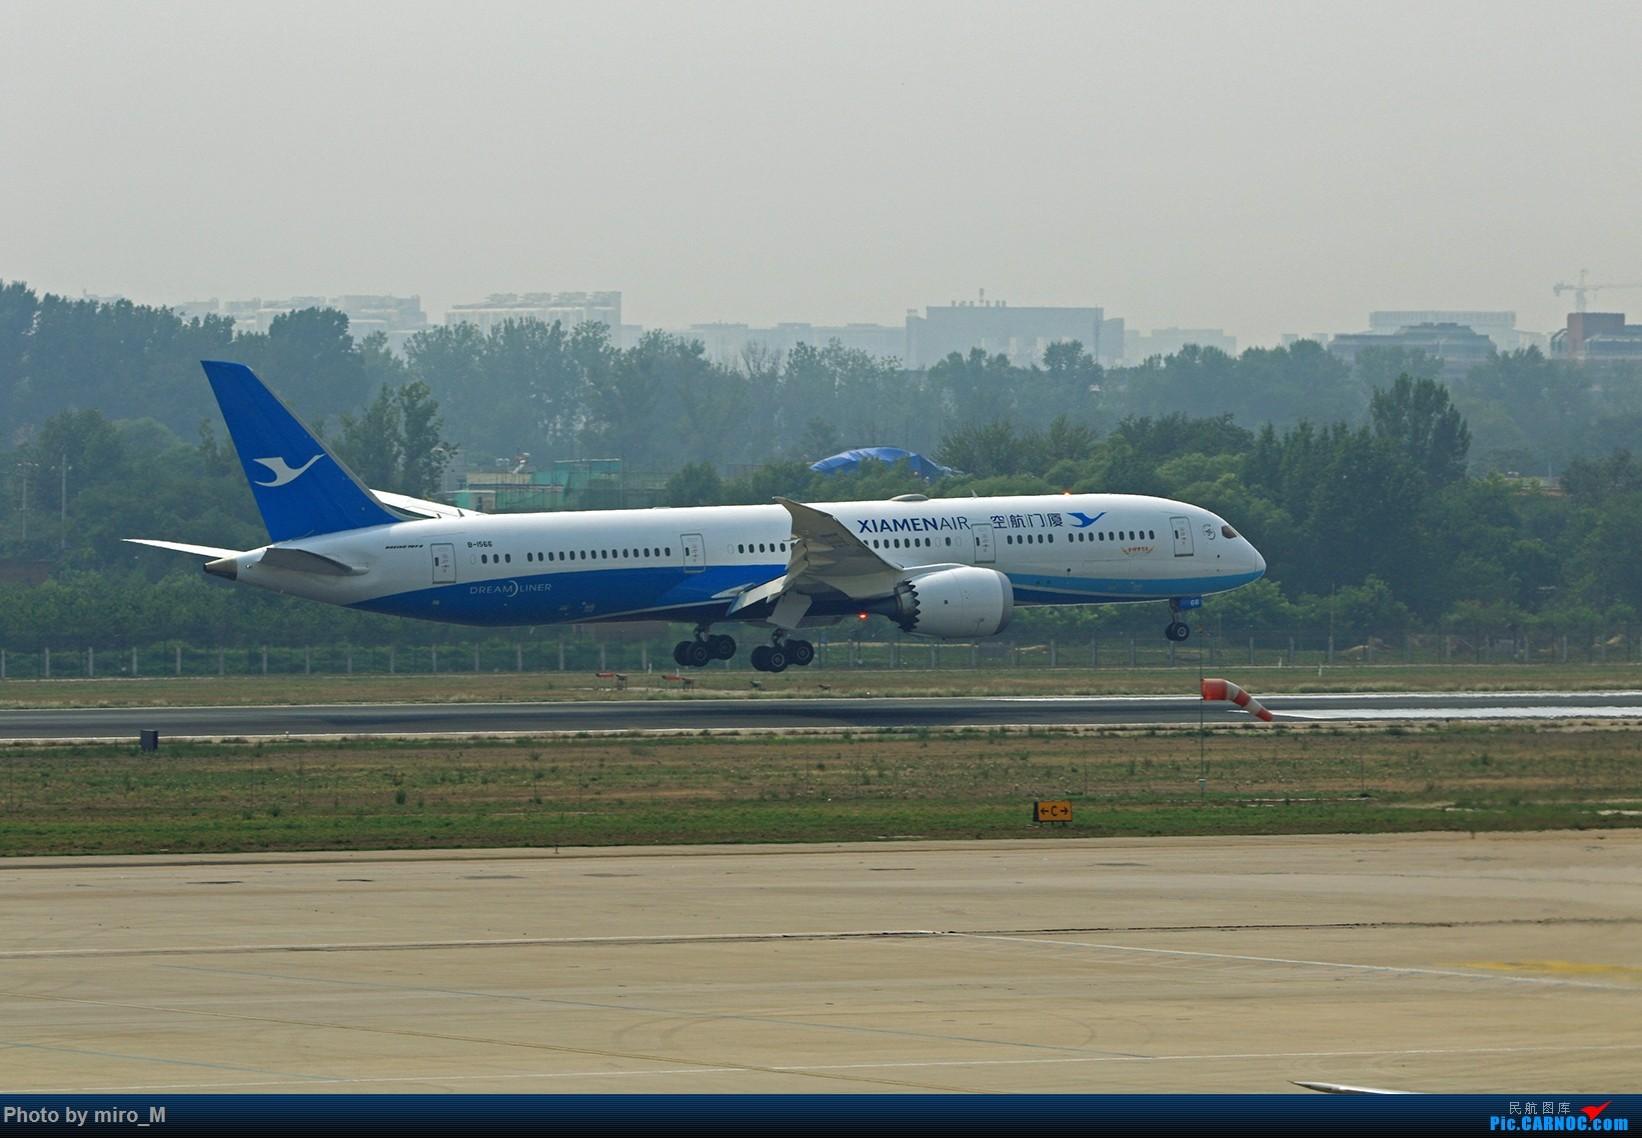 Re:[原创]欧洲浪了一圈,CS100,BAE146,fokker70等新老机型串着飞+ZRH,MUC,FRA,AMS,TLS拍机 BOEING 787-9 B-1566 中国北京首都国际机场